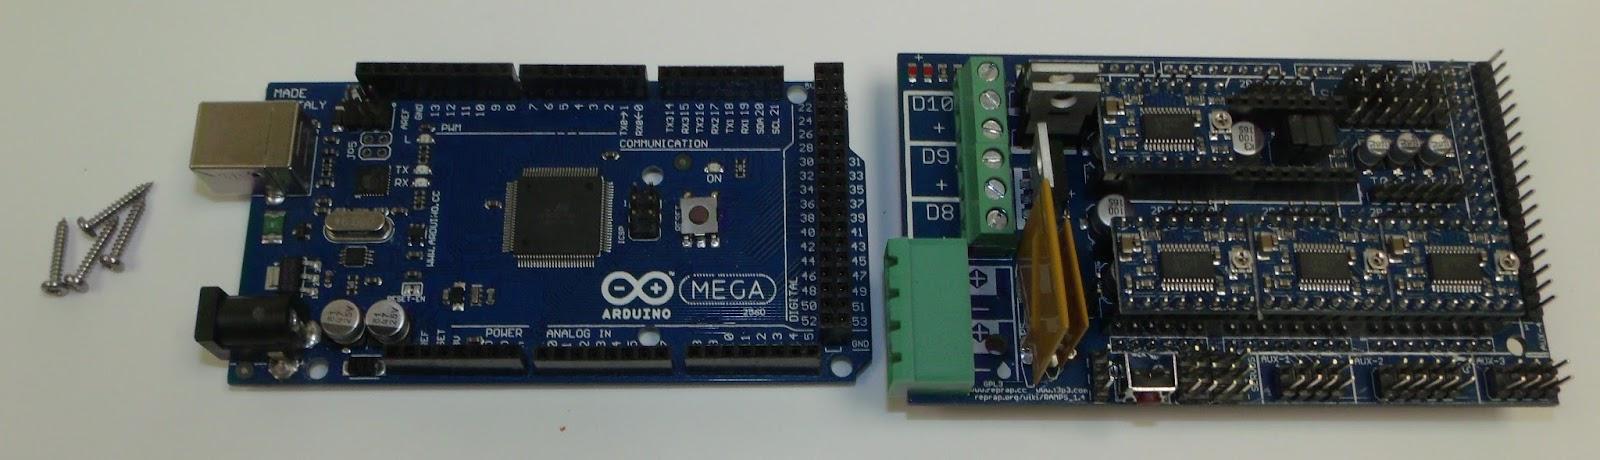 w01-wiring-parts-electronics.jpg